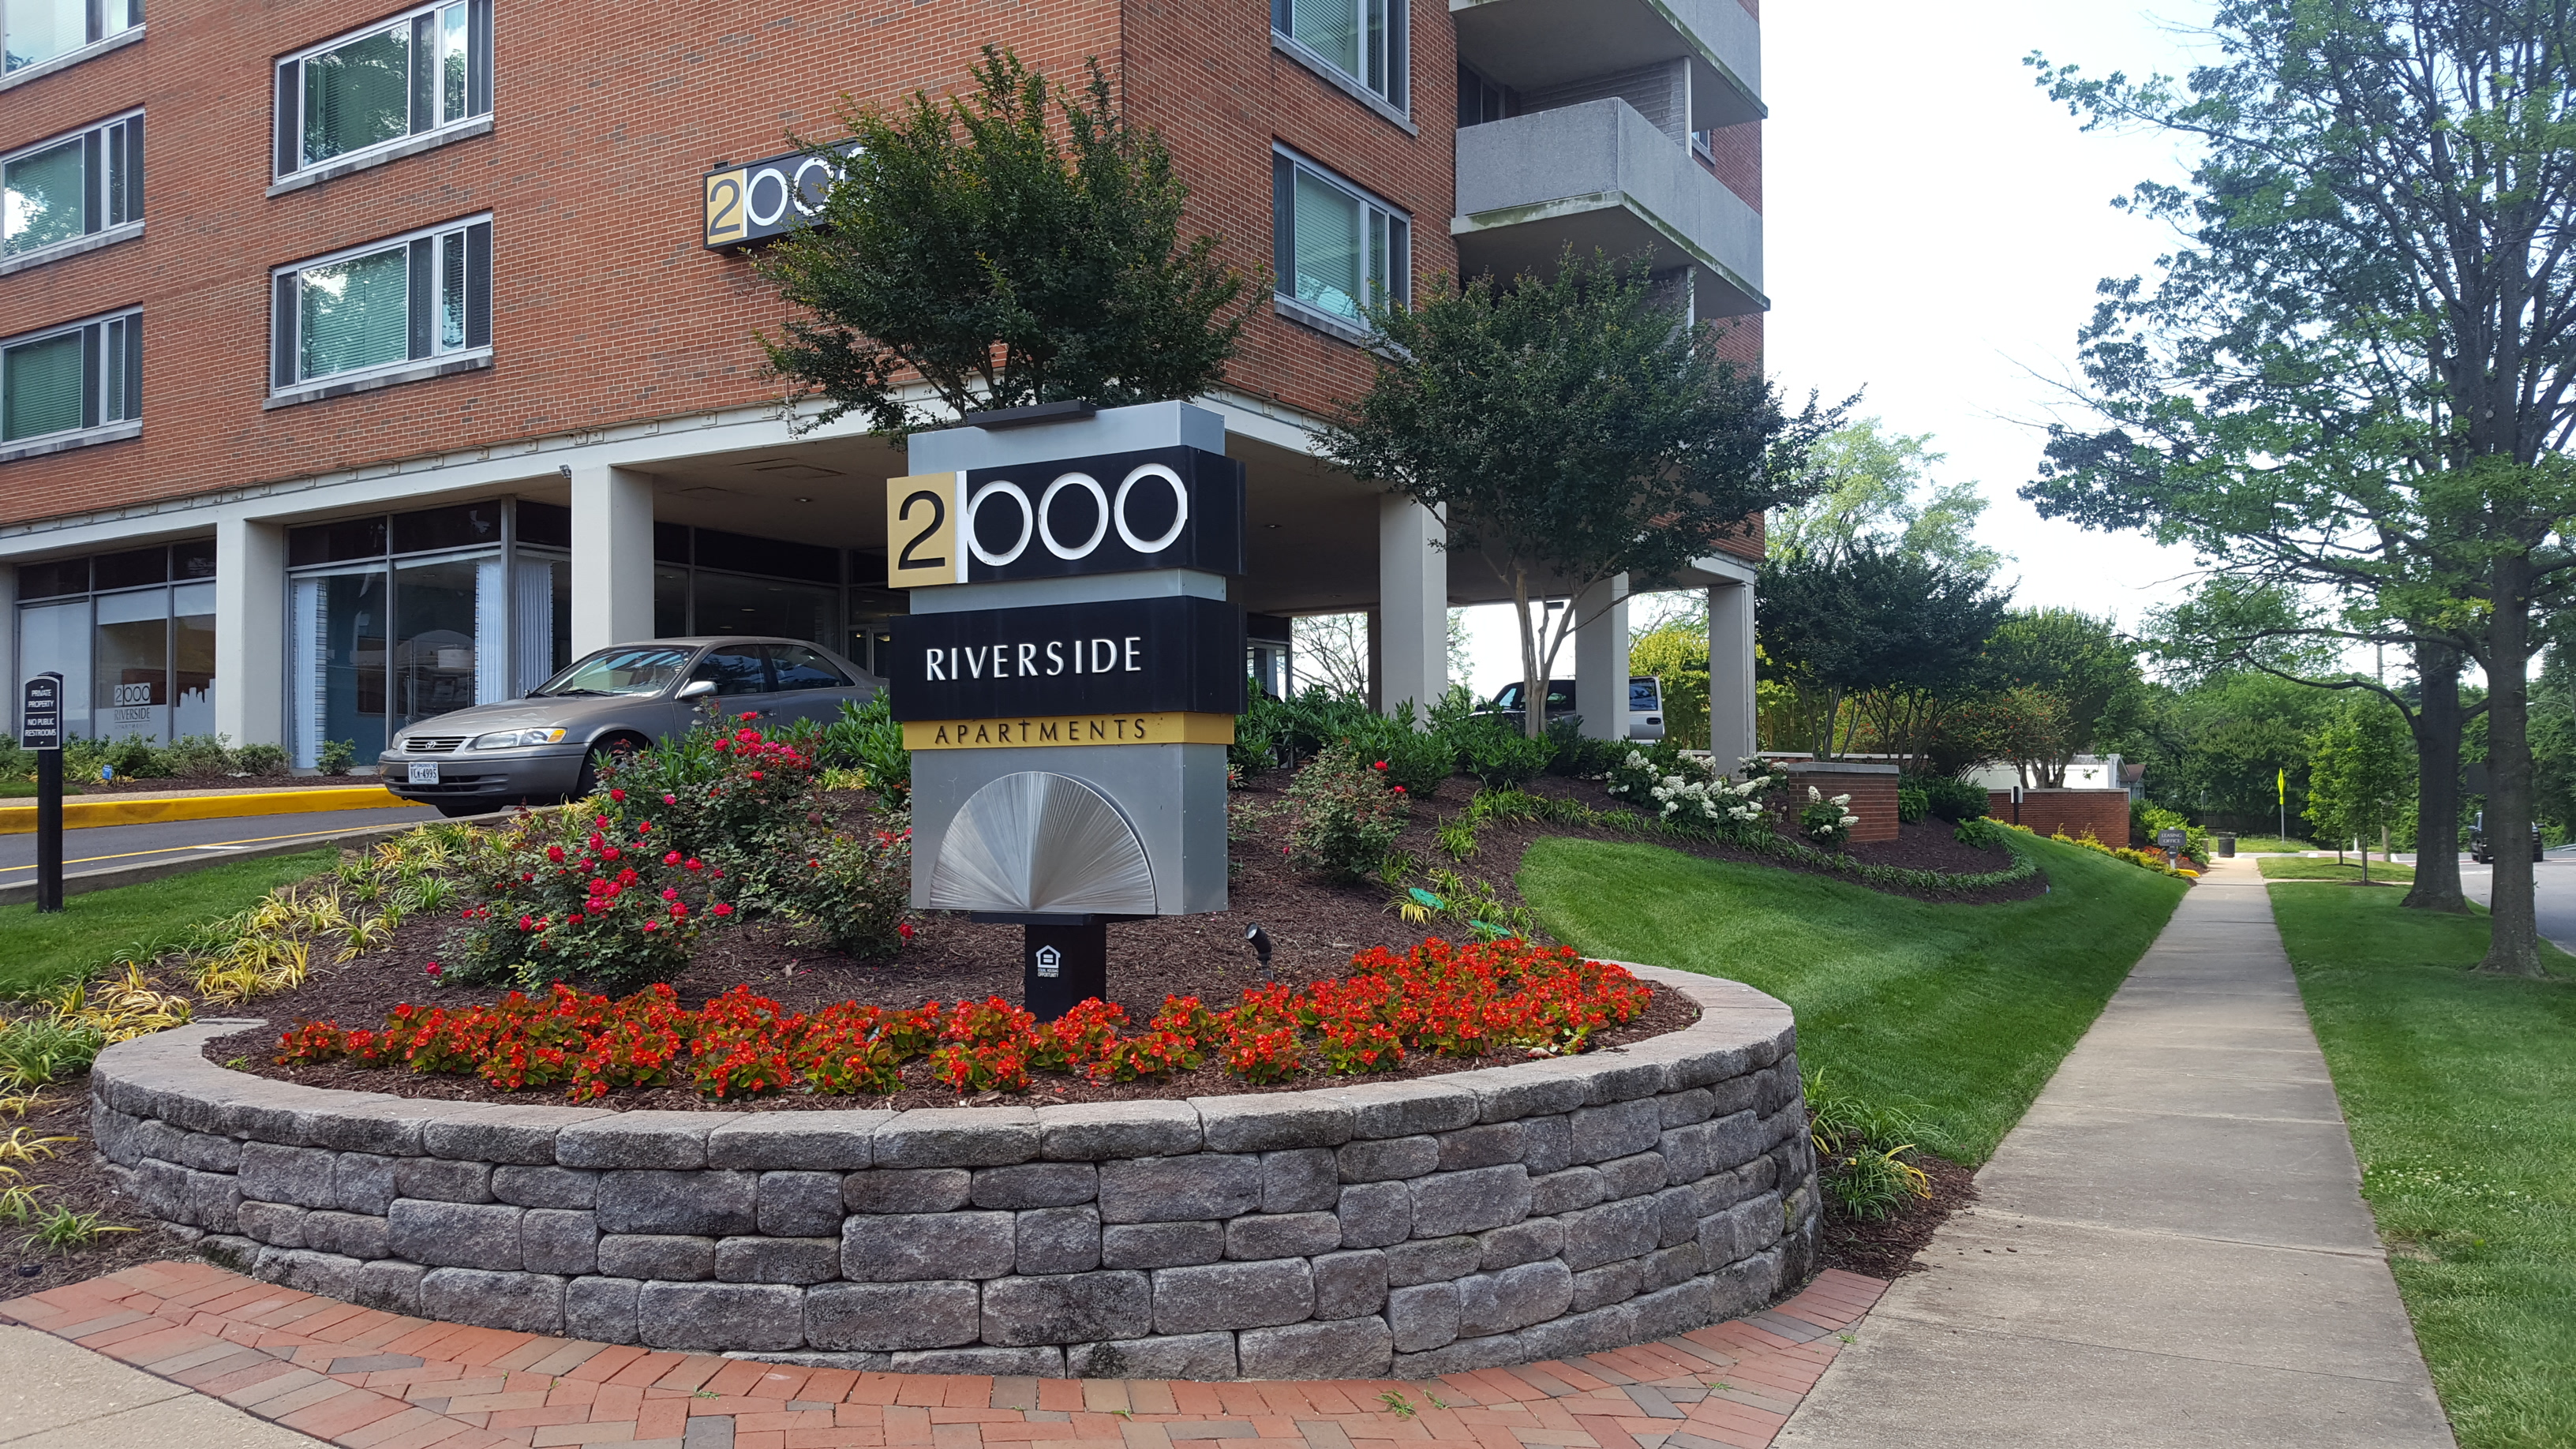 2000 Riverside